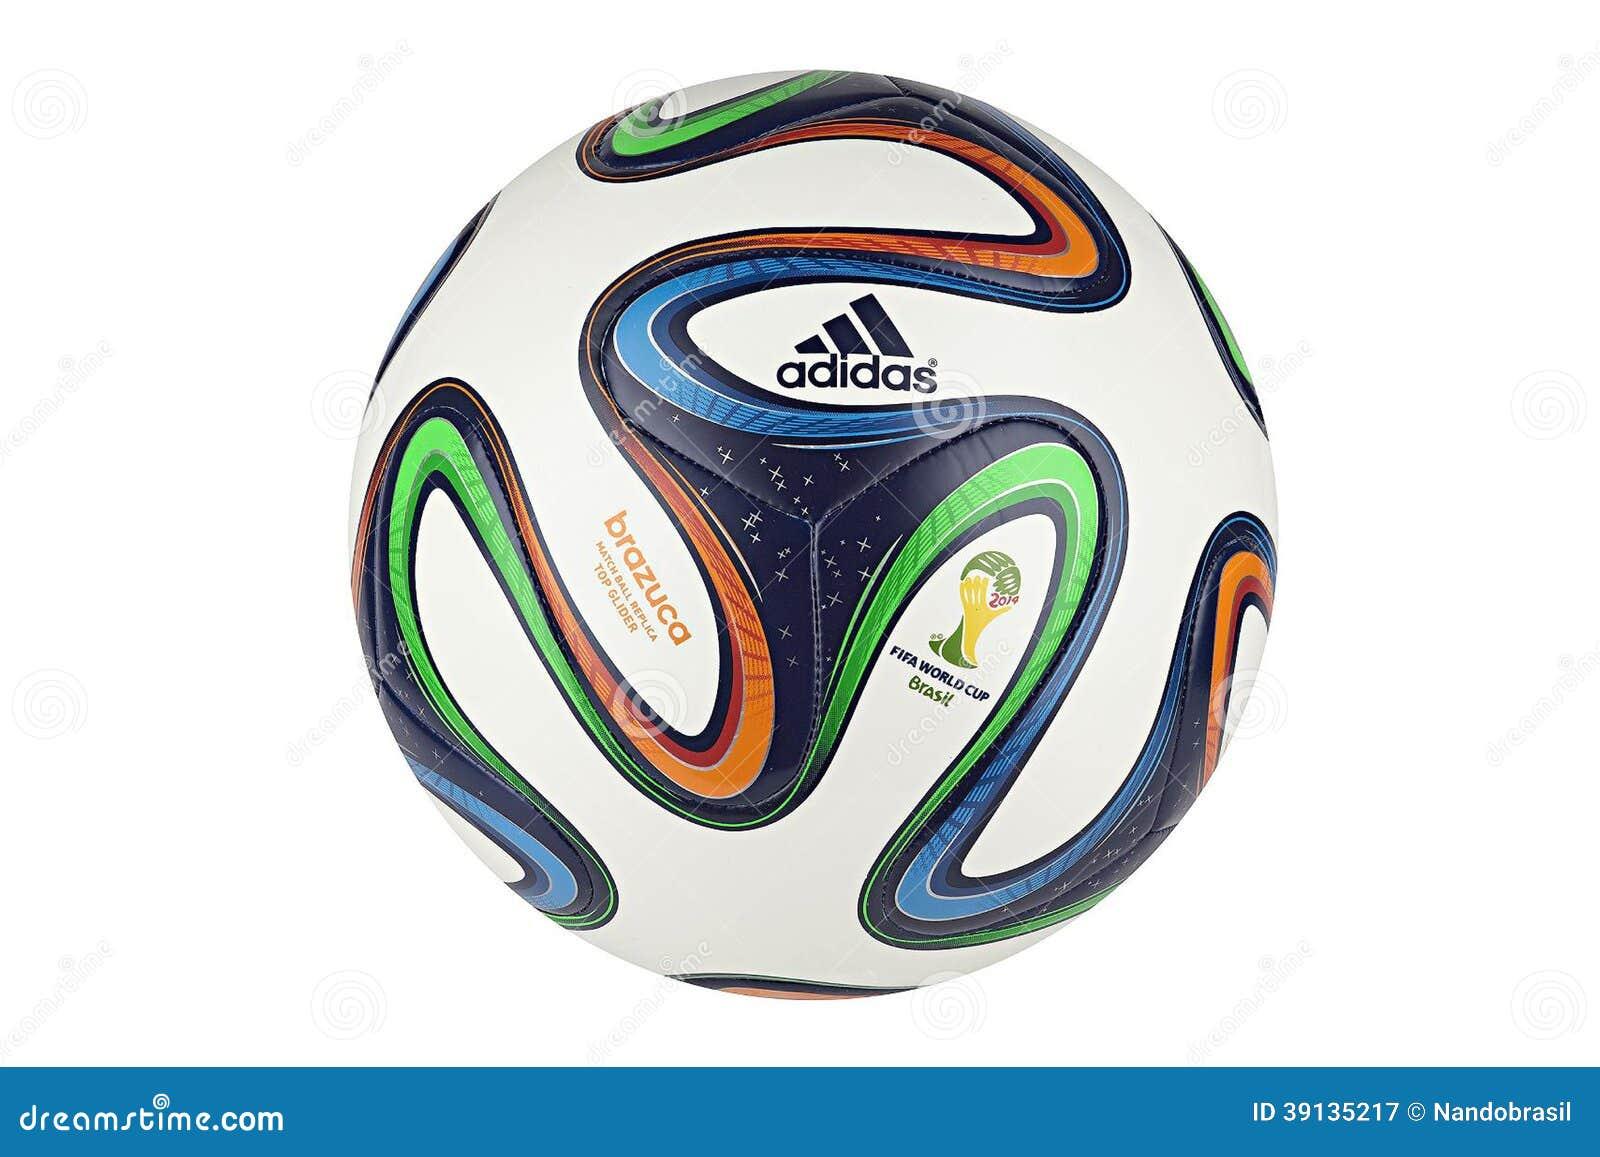 Adidas Brazuca World Cup 2014 Official Matchball